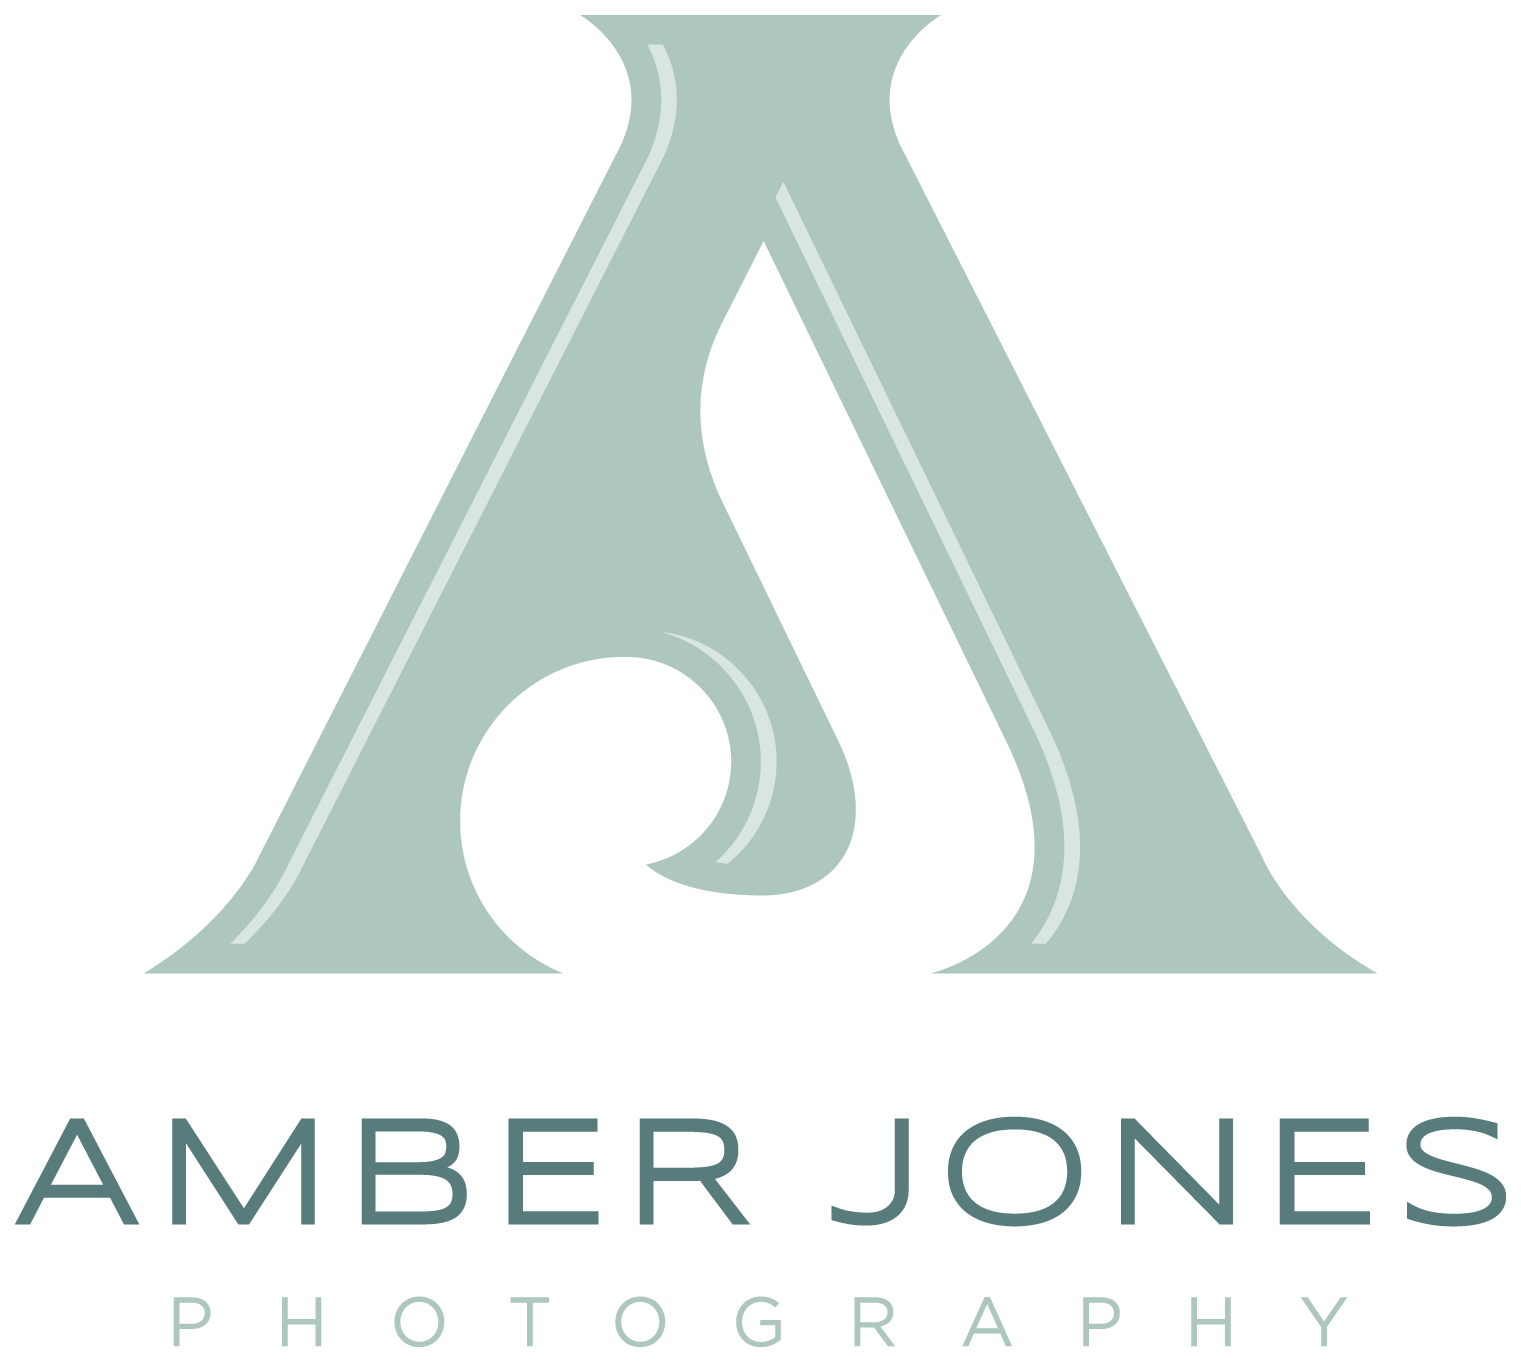 Amber Jones Photography.png